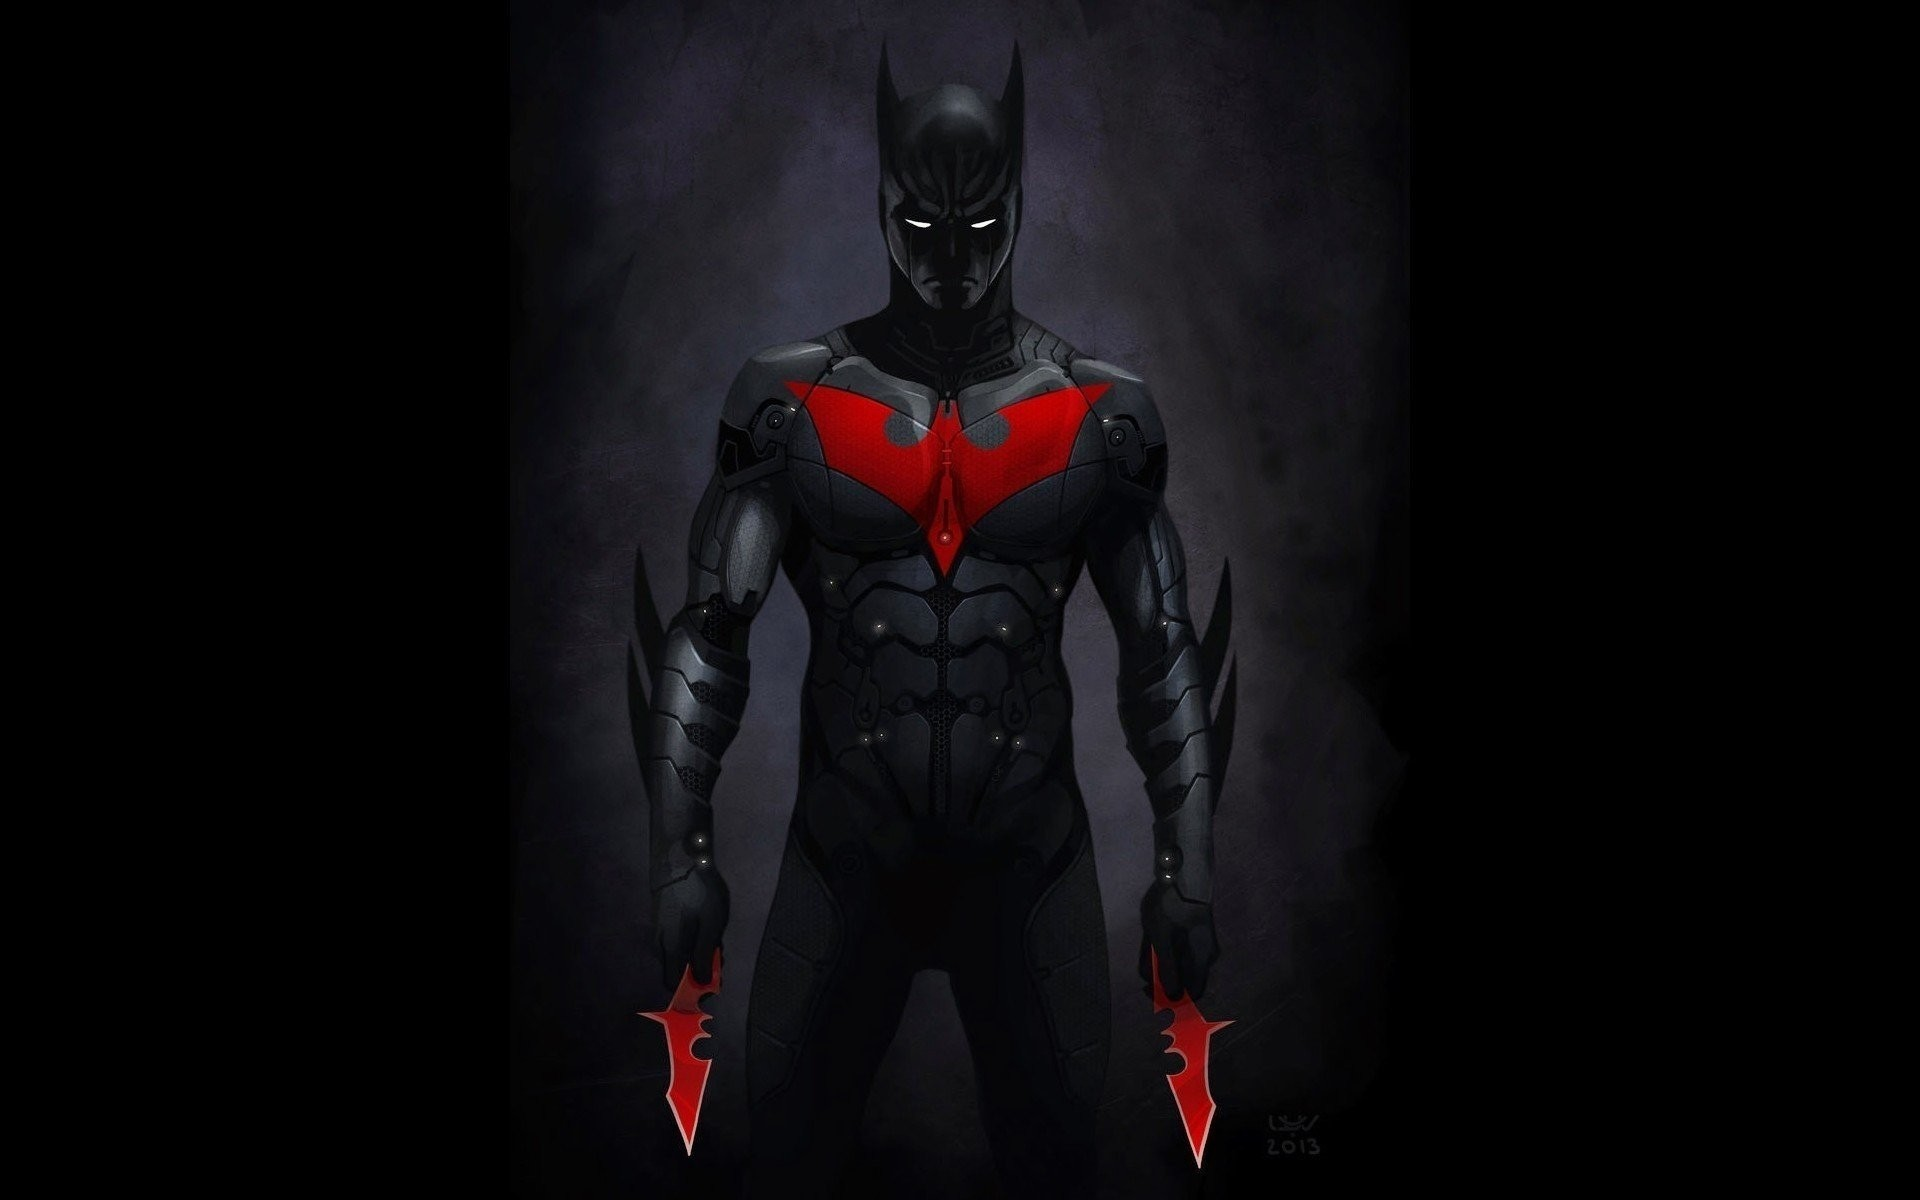 betarangi superhero dc comics black art batman beyond